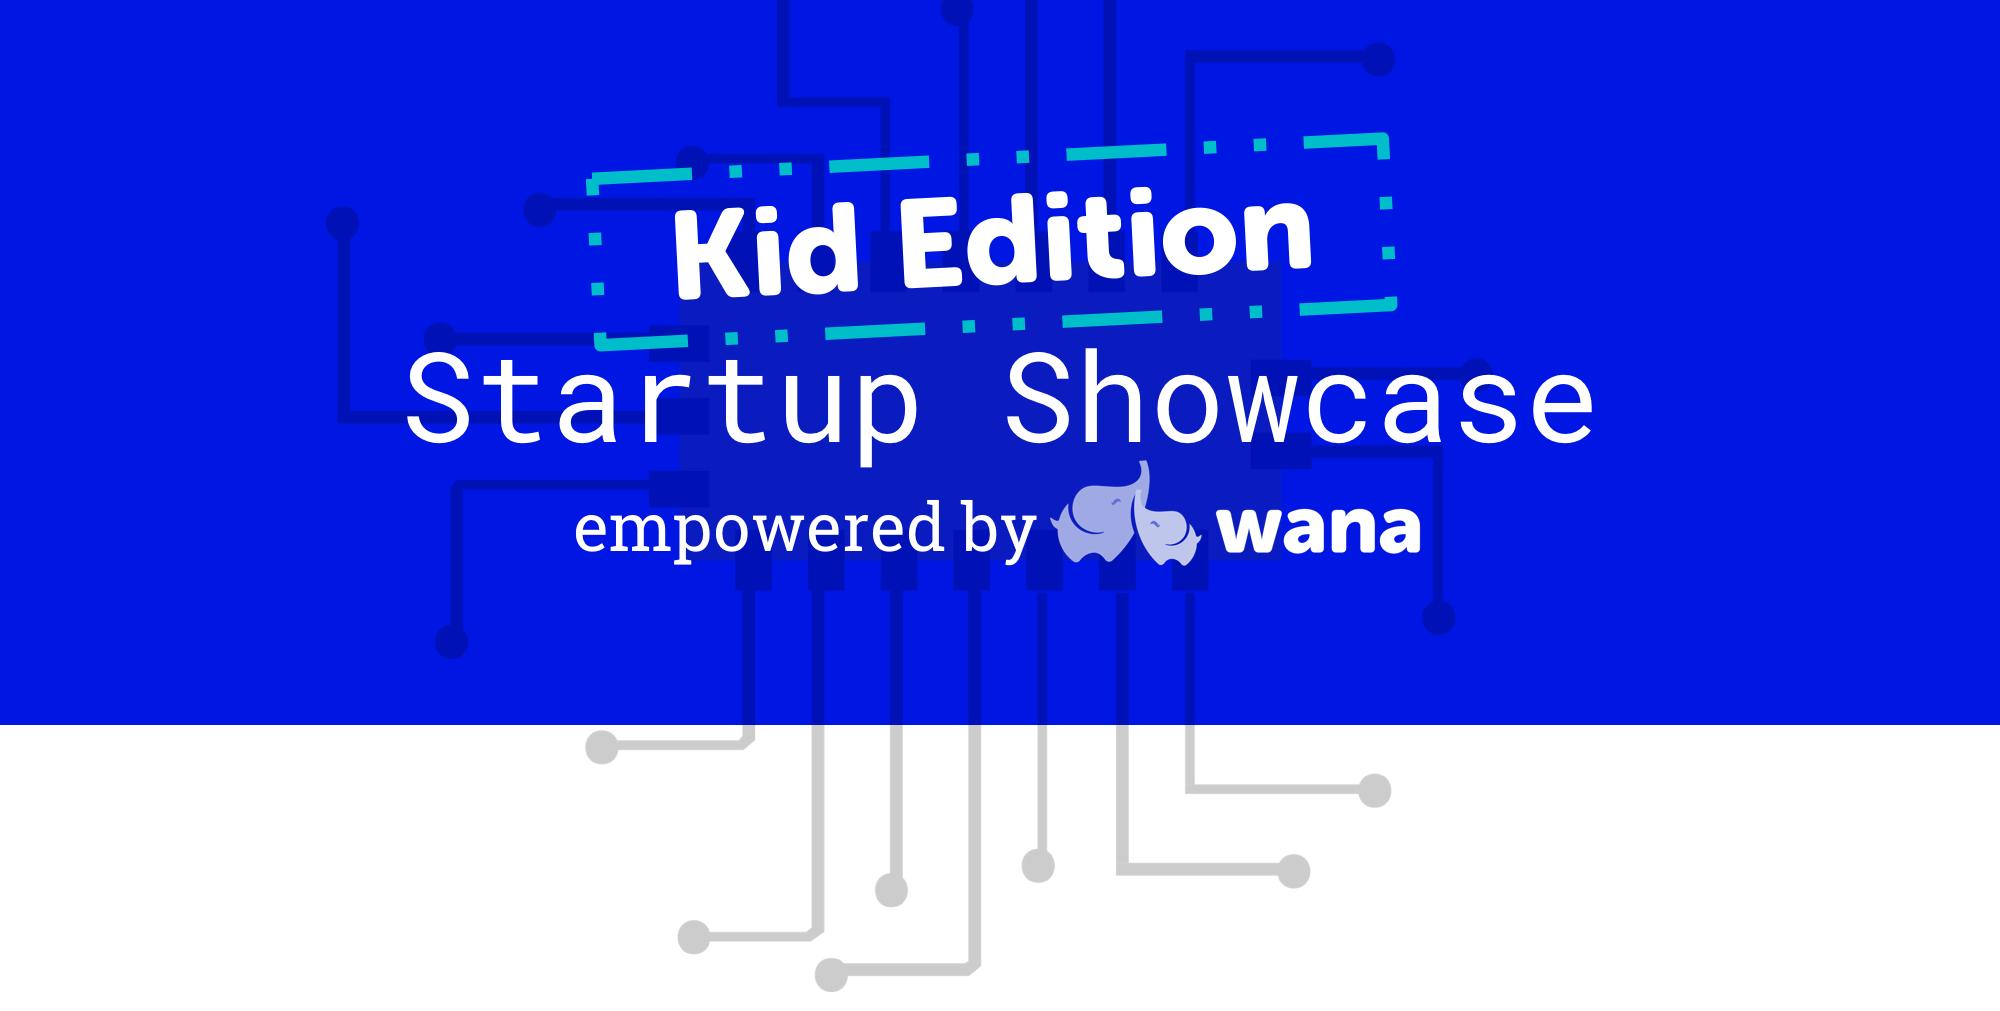 Kids Startup Showcase at Glendale Tech Week by Wana